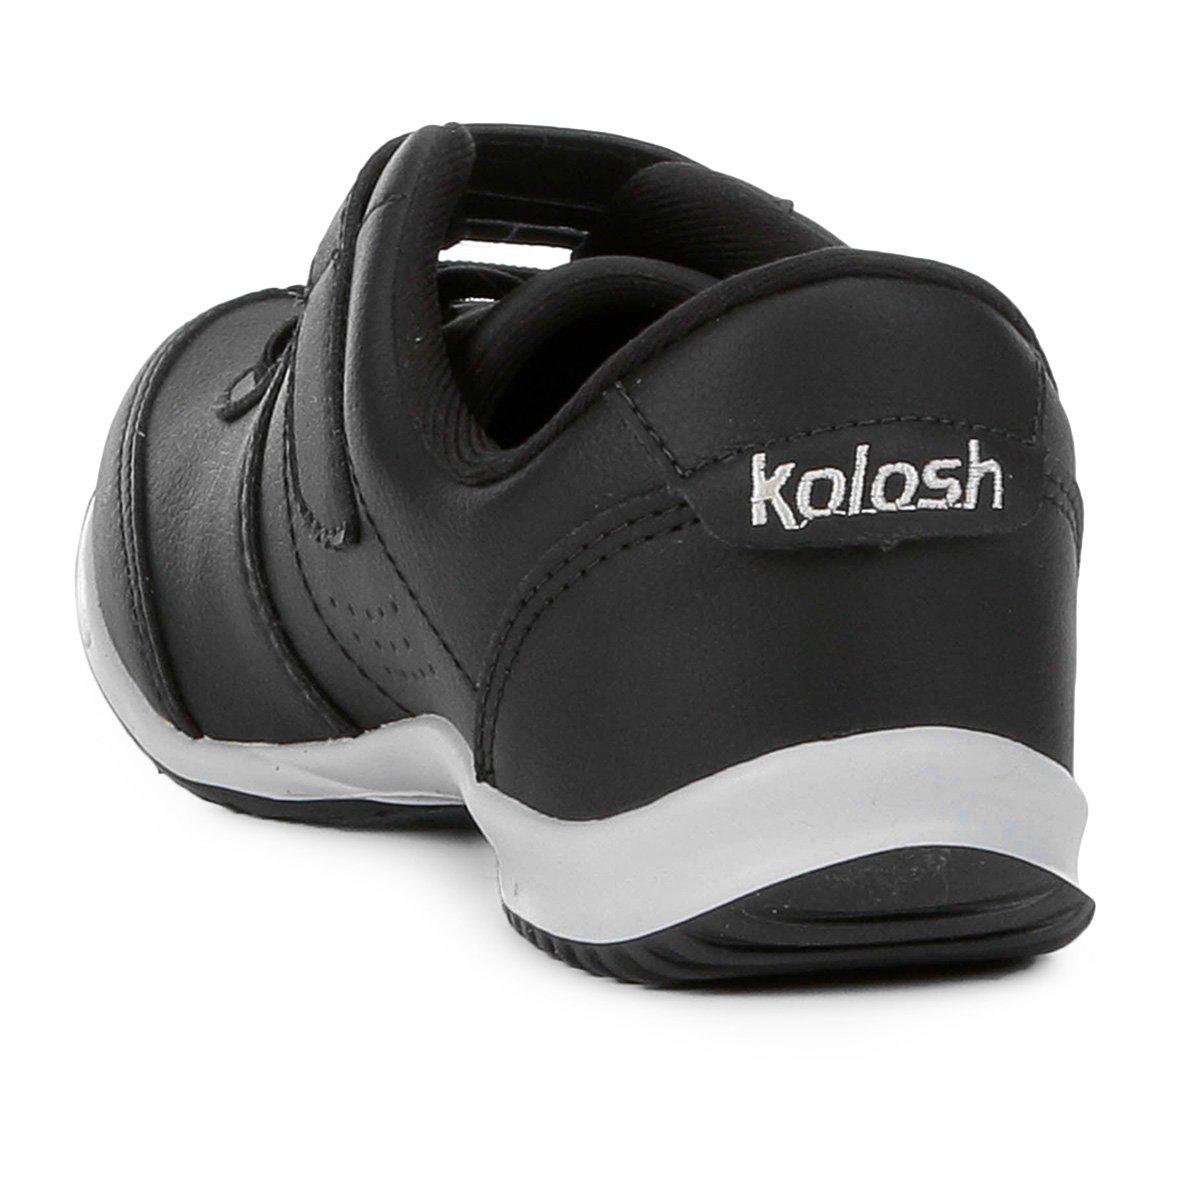 Kolosh Feminino Velcro Cadarço Tênis Tênis Kolosh Preto qxn4HRE